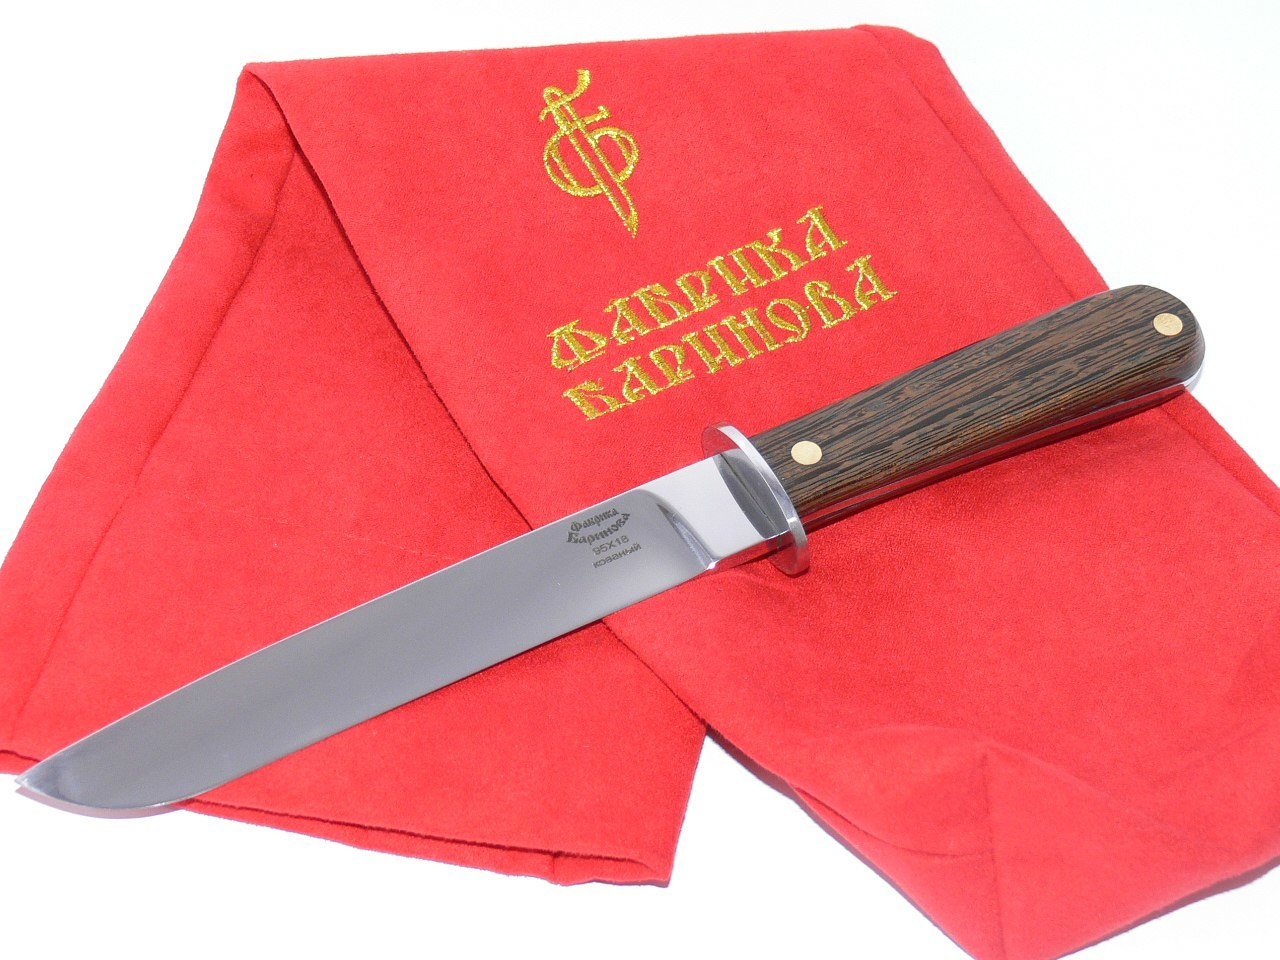 Фото 19 - Нож Окопник-2, сталь 95Х18, венге от Фабрика Баринова